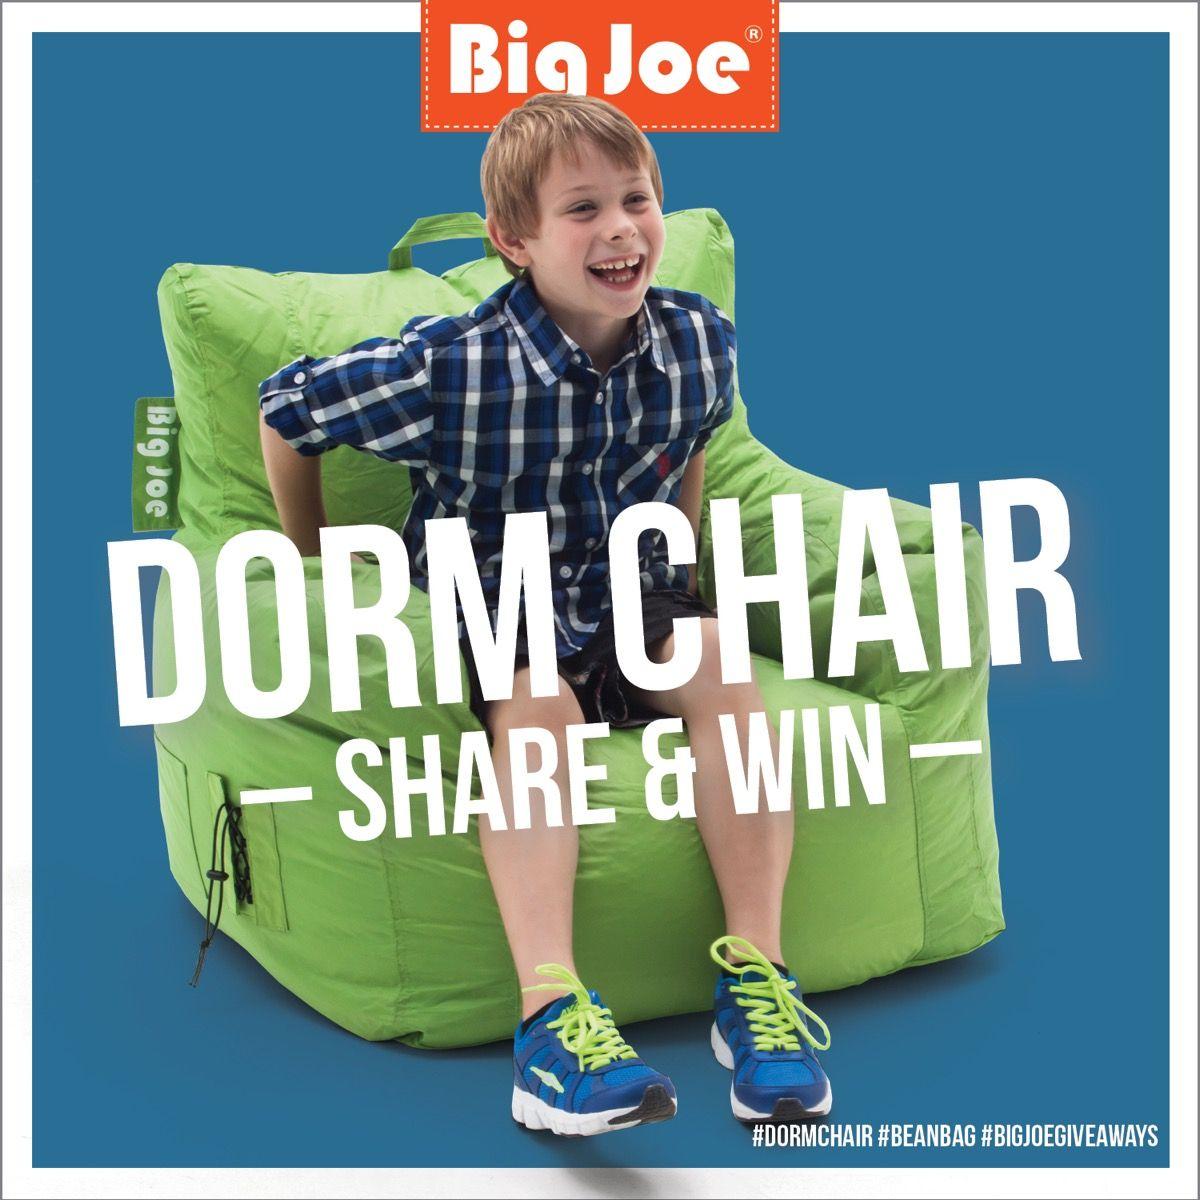 WIN a Big Joe Dorm Chair Dorm chairs, Dorm, Comfy chairs